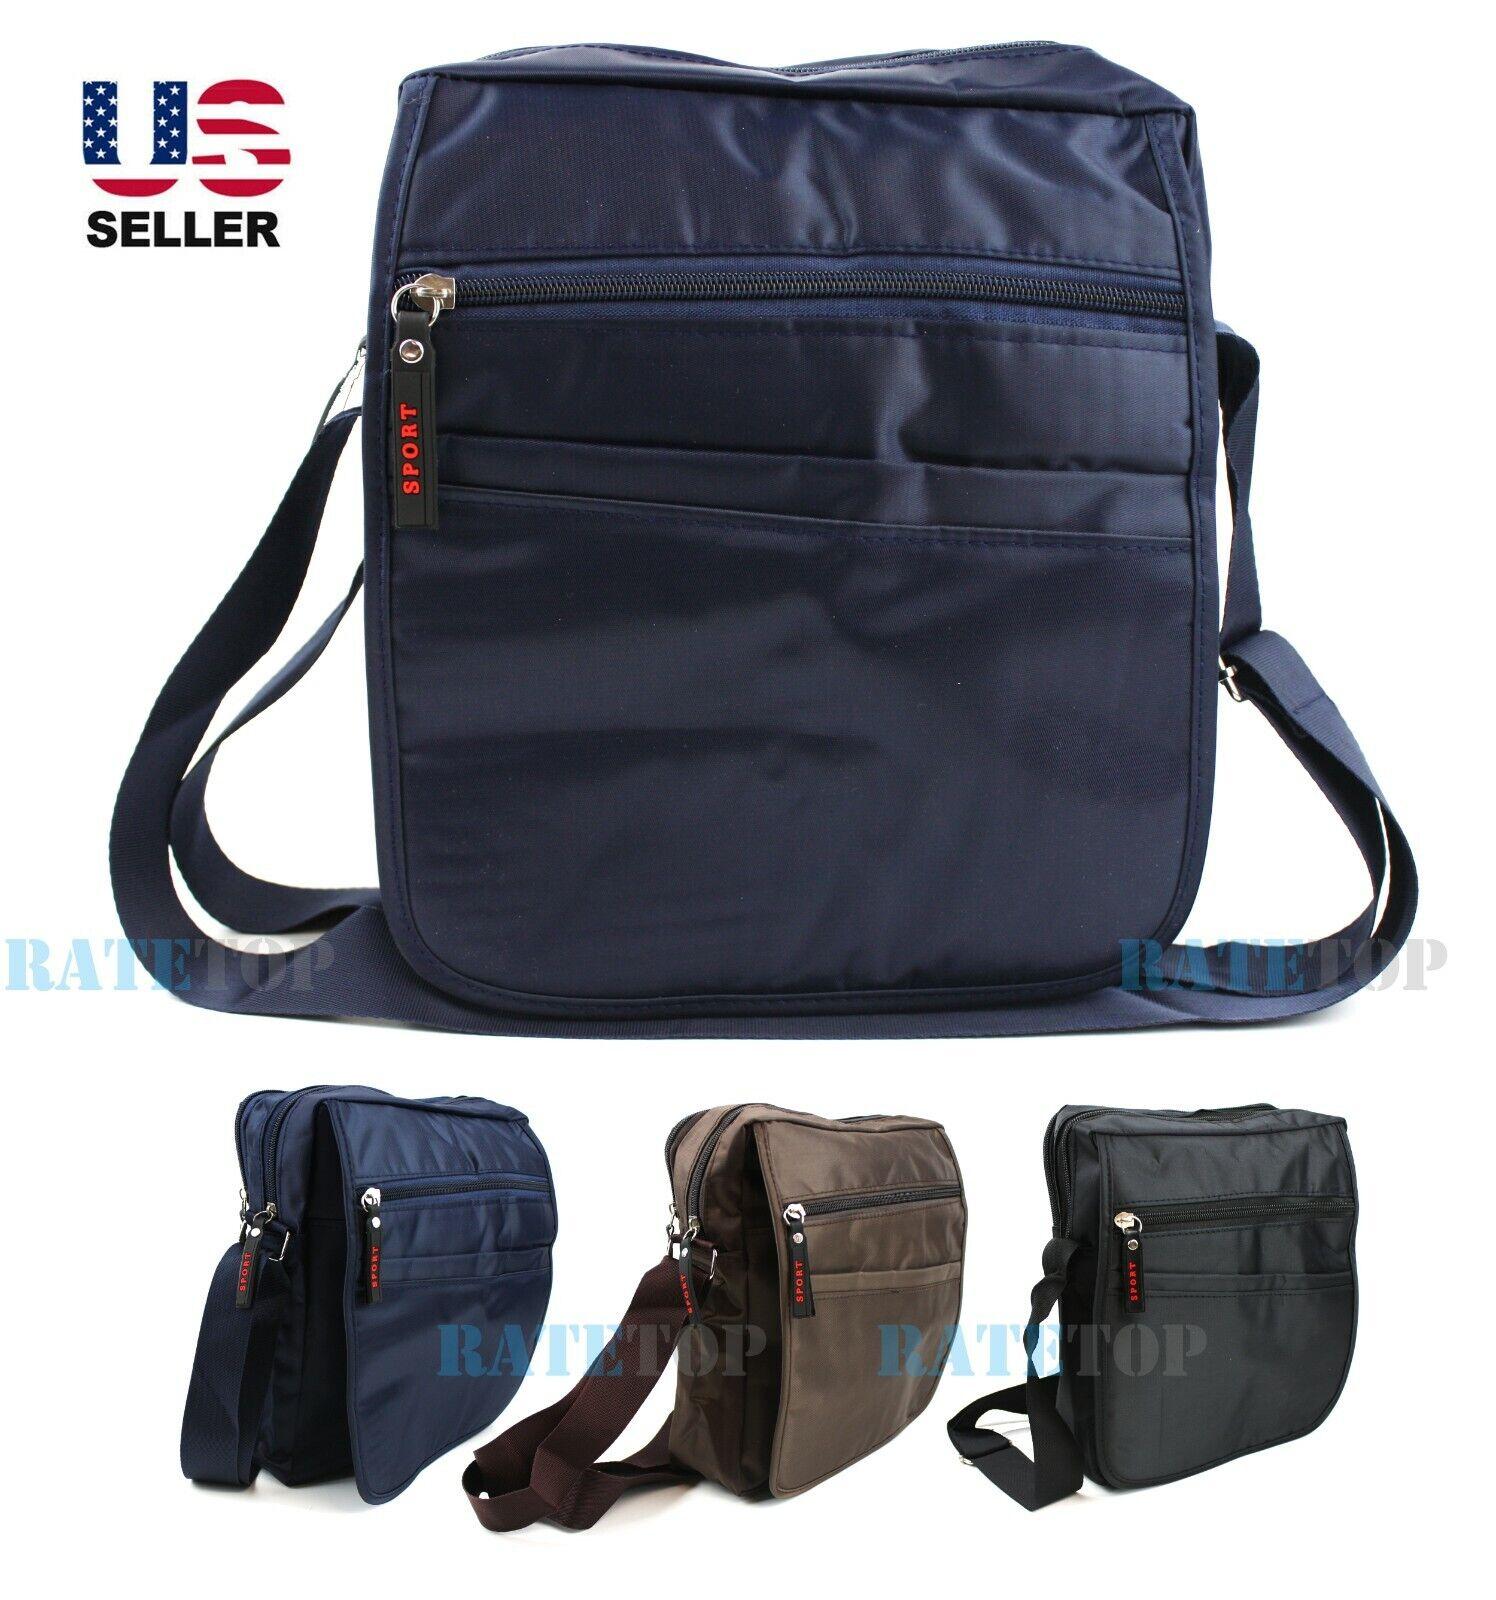 Mens Nylon Waterproof Crossbody Messenger Shoulder Bag Satchel Sport Travel Work Bags